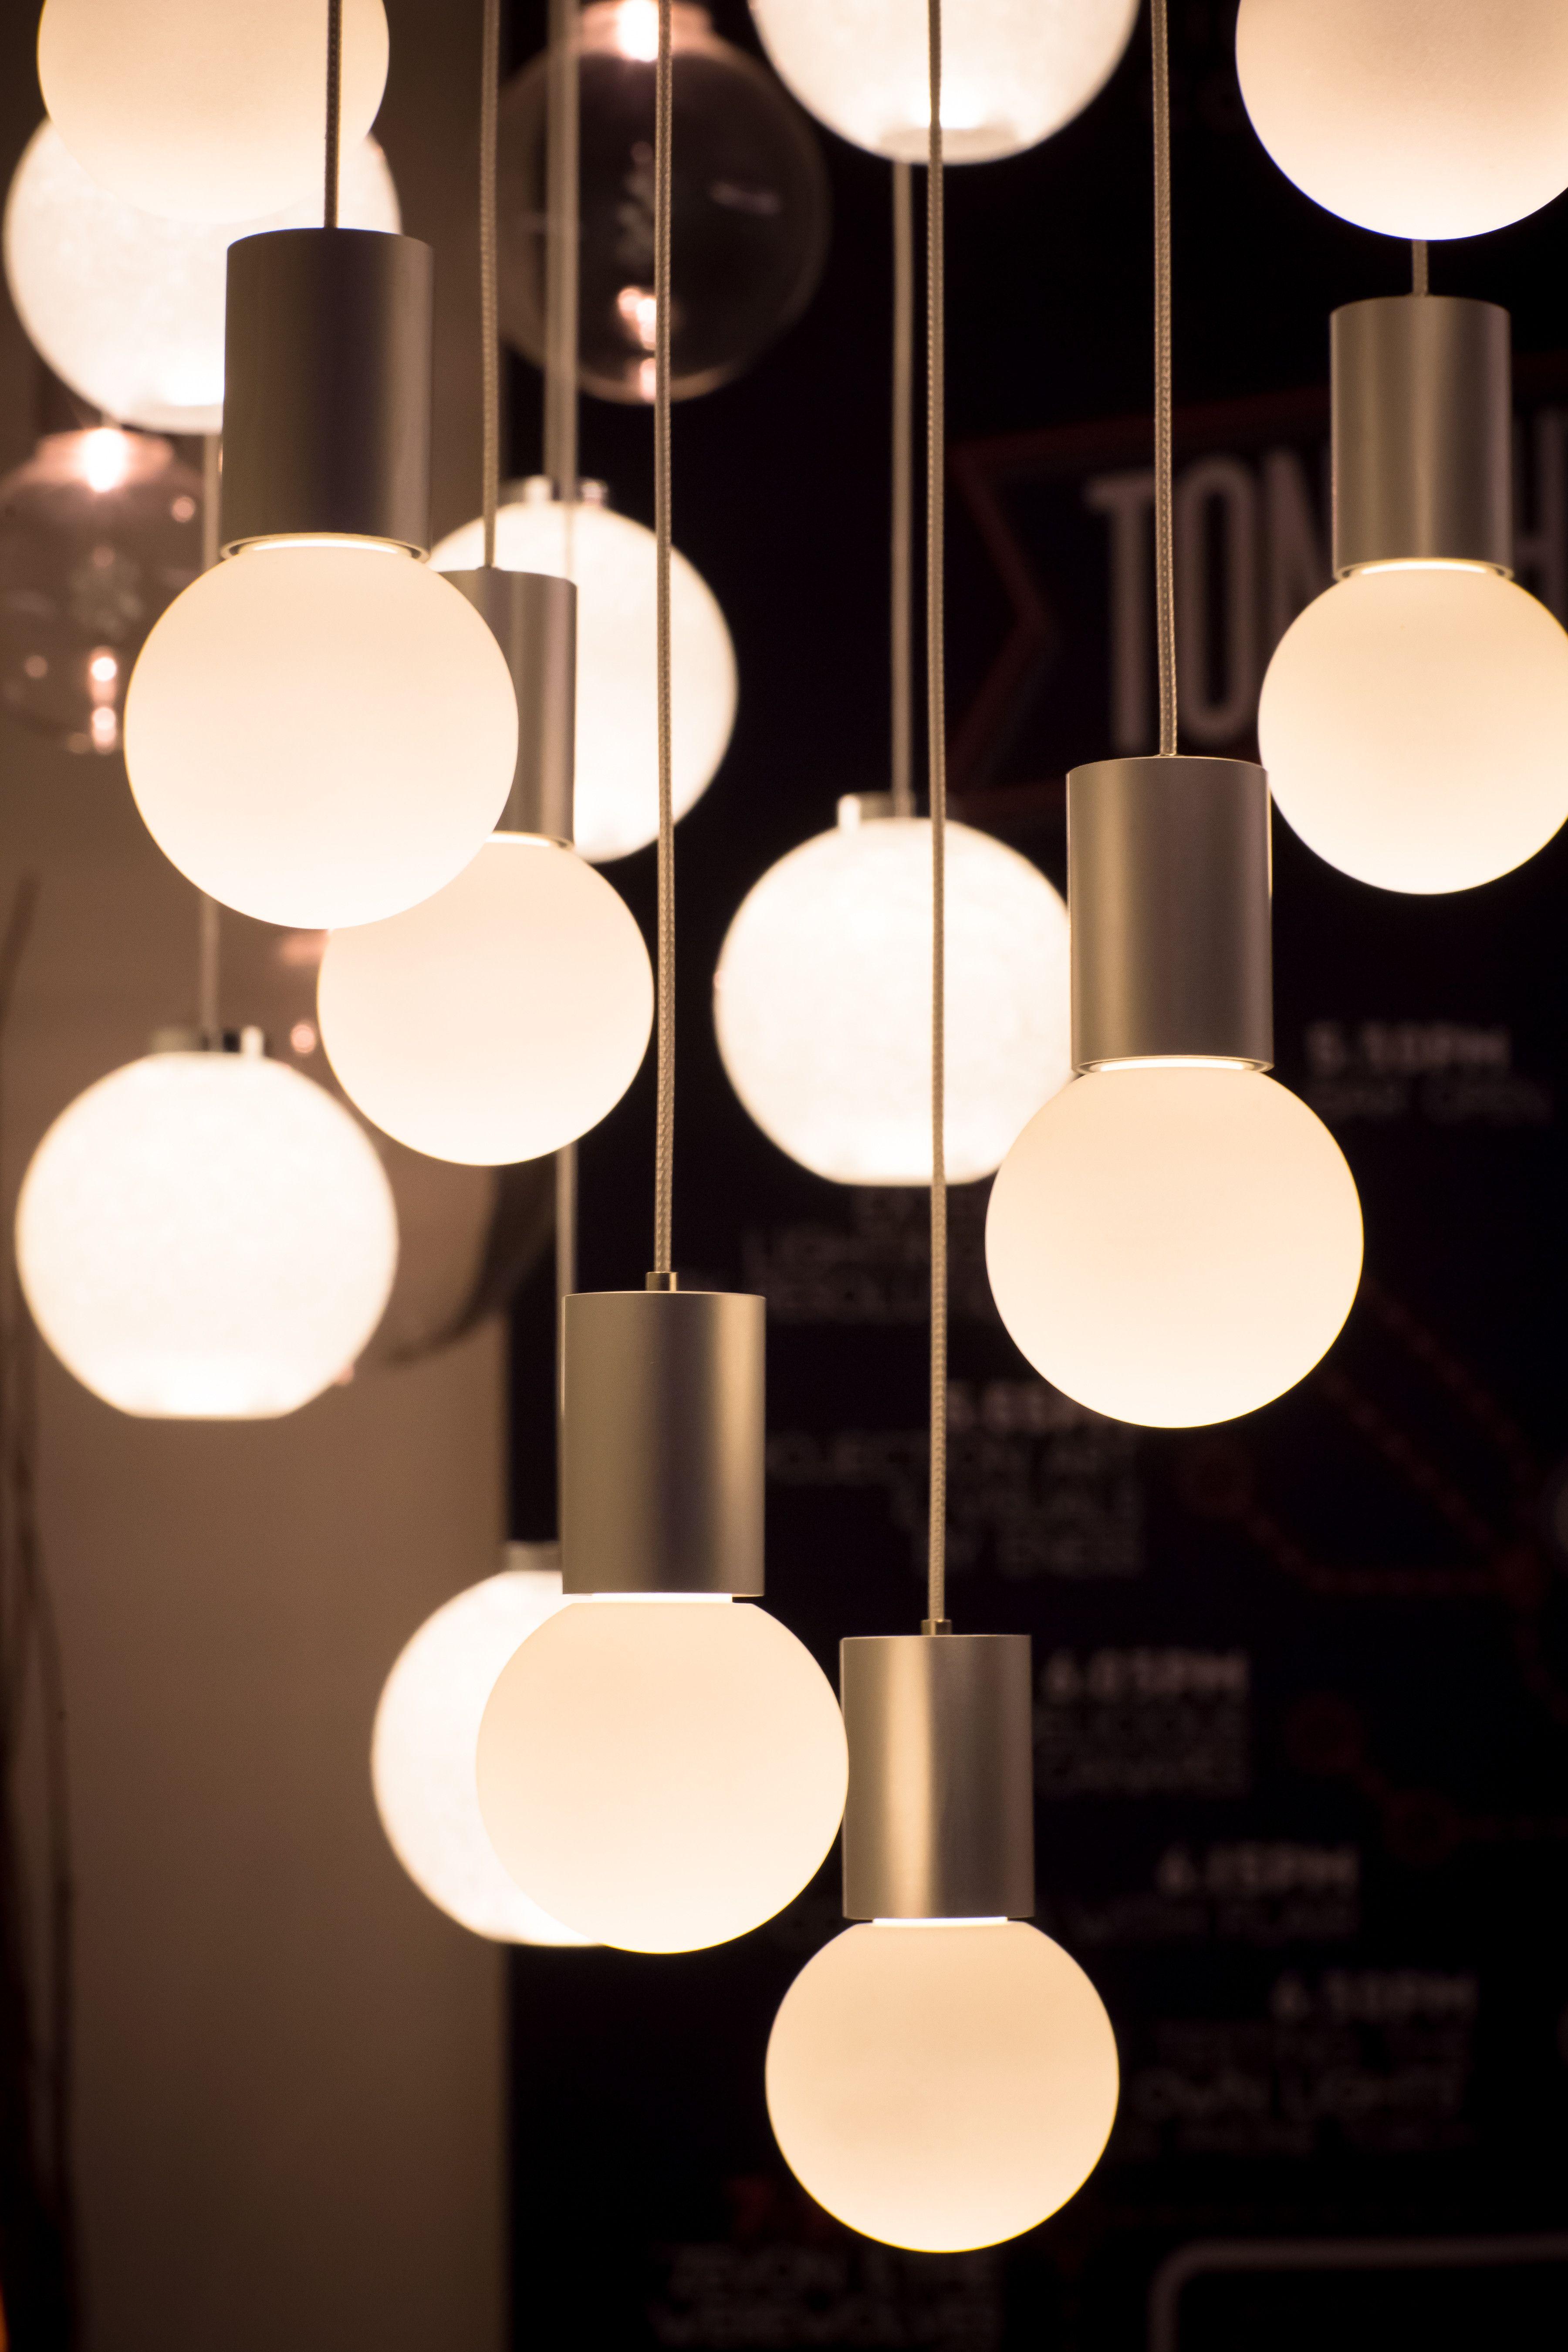 Darkon Lighting Wrecking Ball LED Pendant Acrylic Architectural Lights #darkonlighting #LED #lightart #lightingdesign